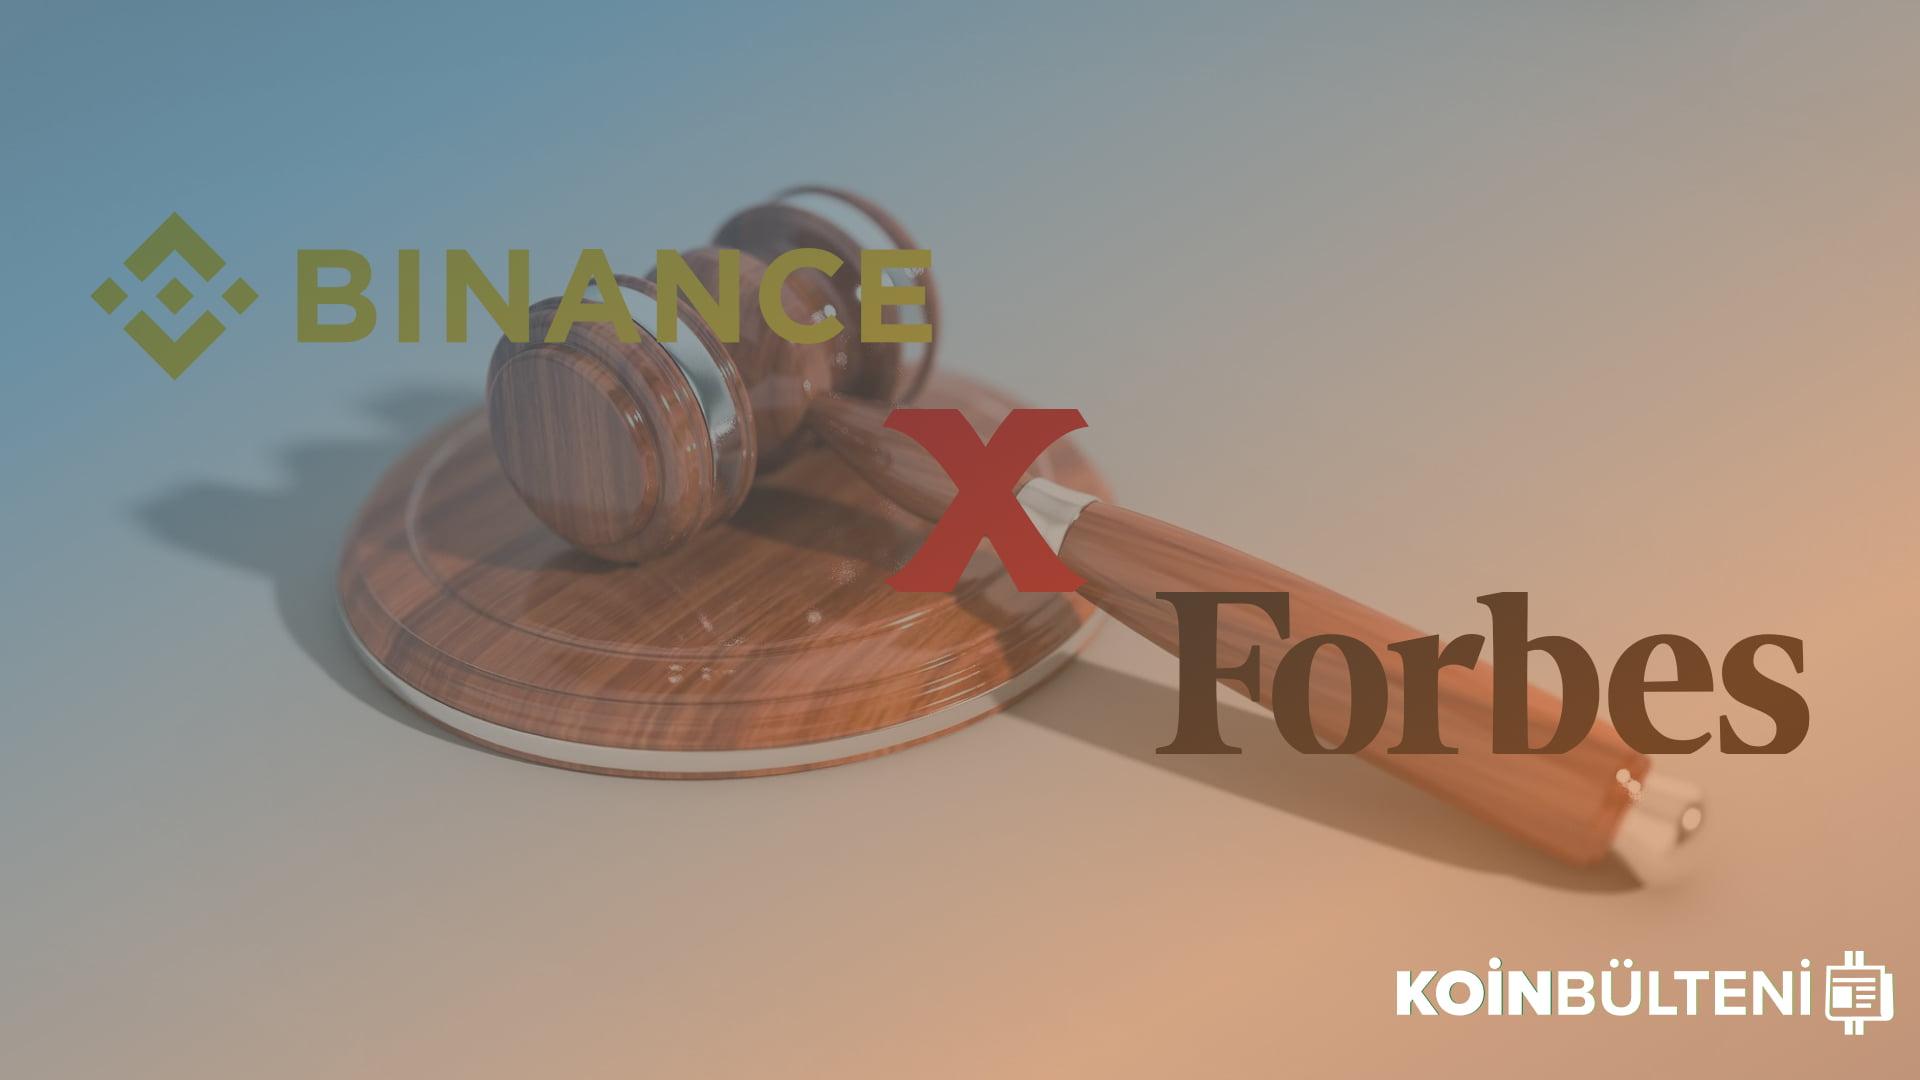 binance-forbes-davasi